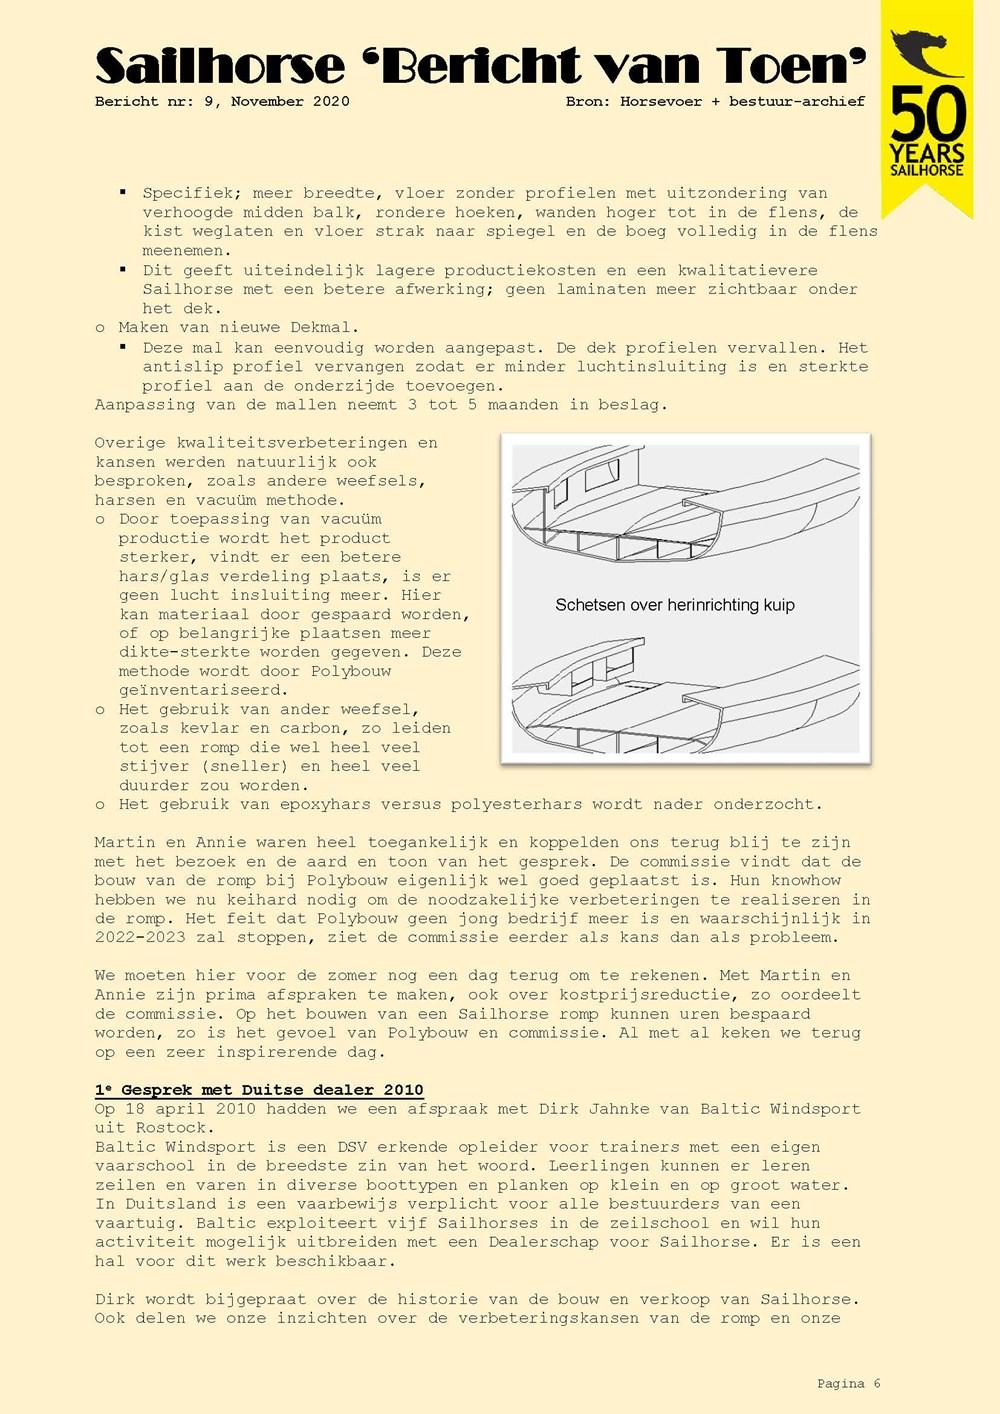 BvT09_Page_06.jpg